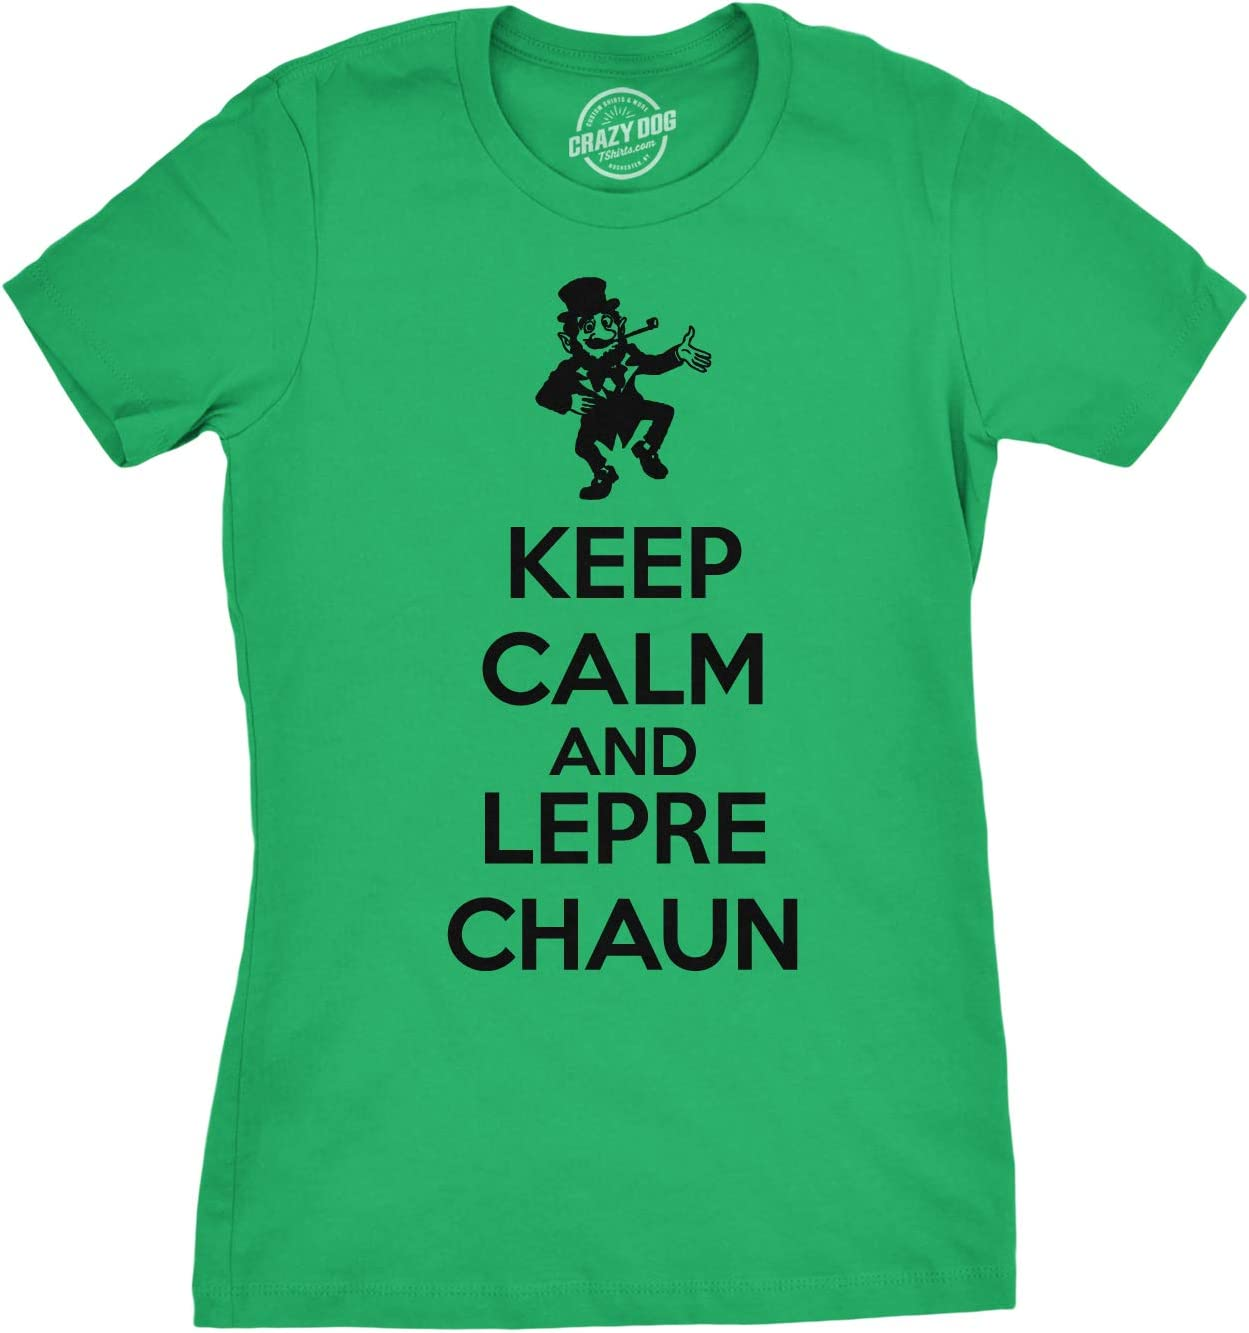 Womens Keep Calm And Leprechaun T Shirt Funny KCCO Drinking Tee